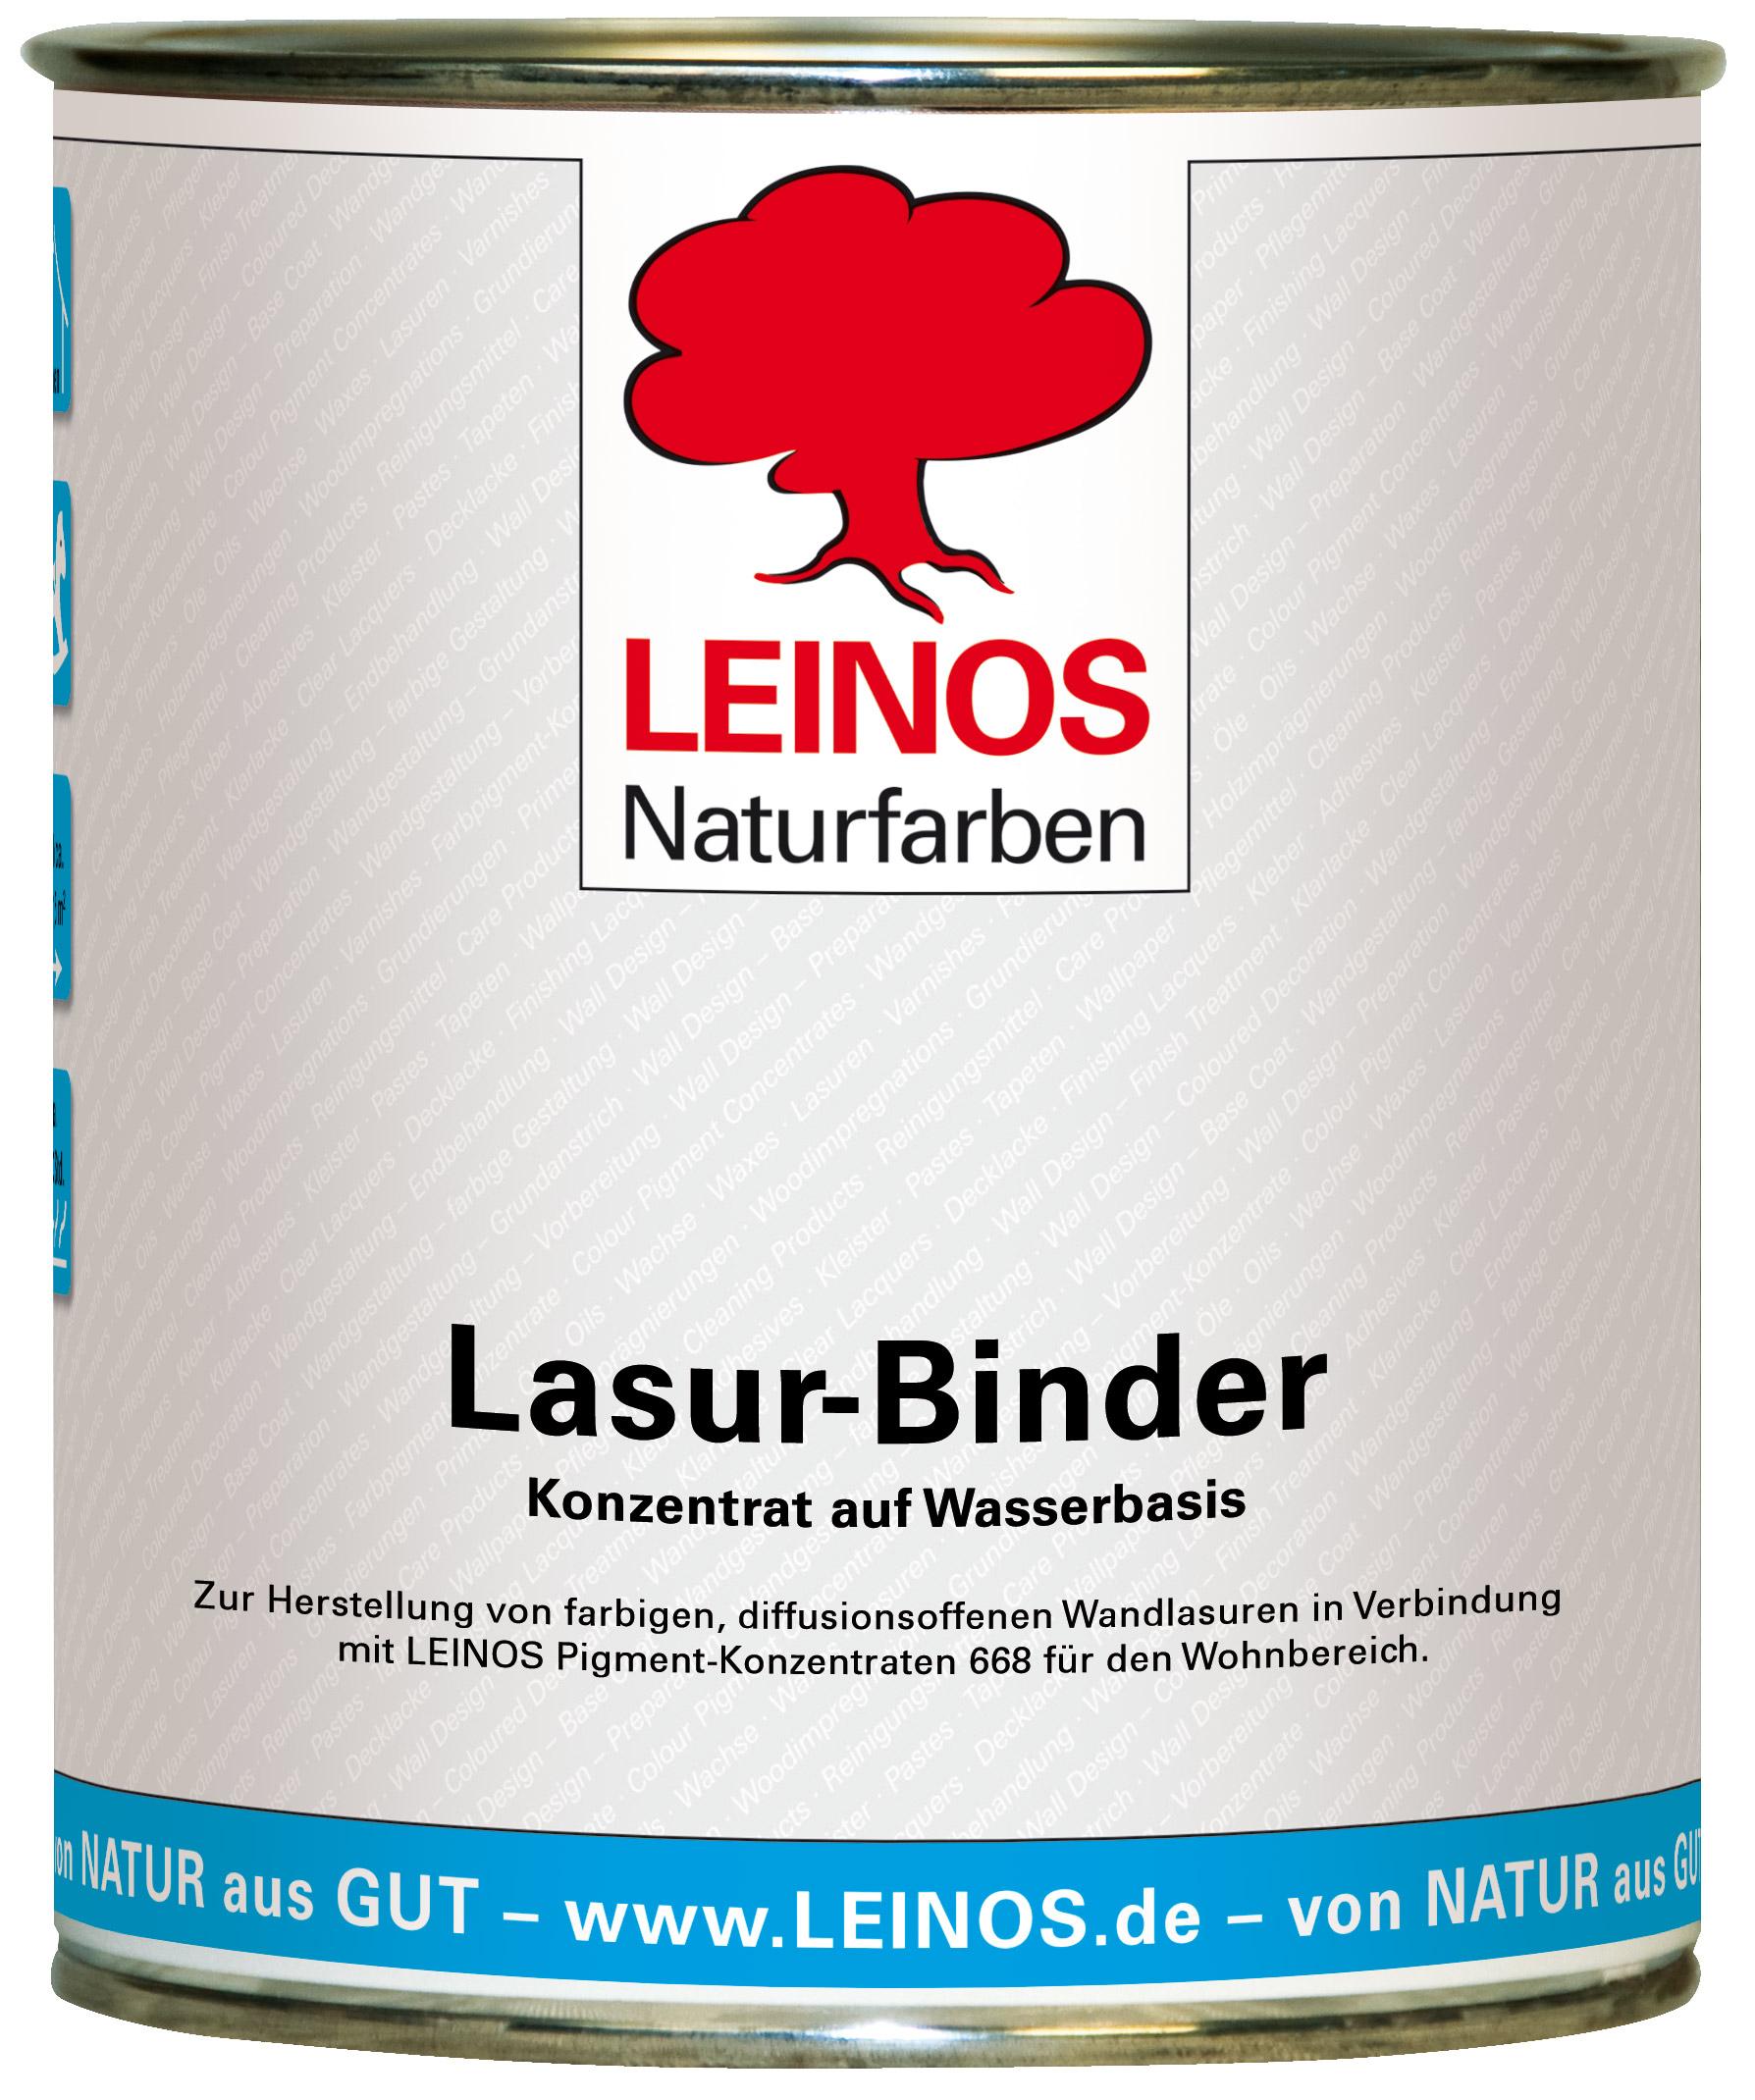 Leinos Lasur-Binder